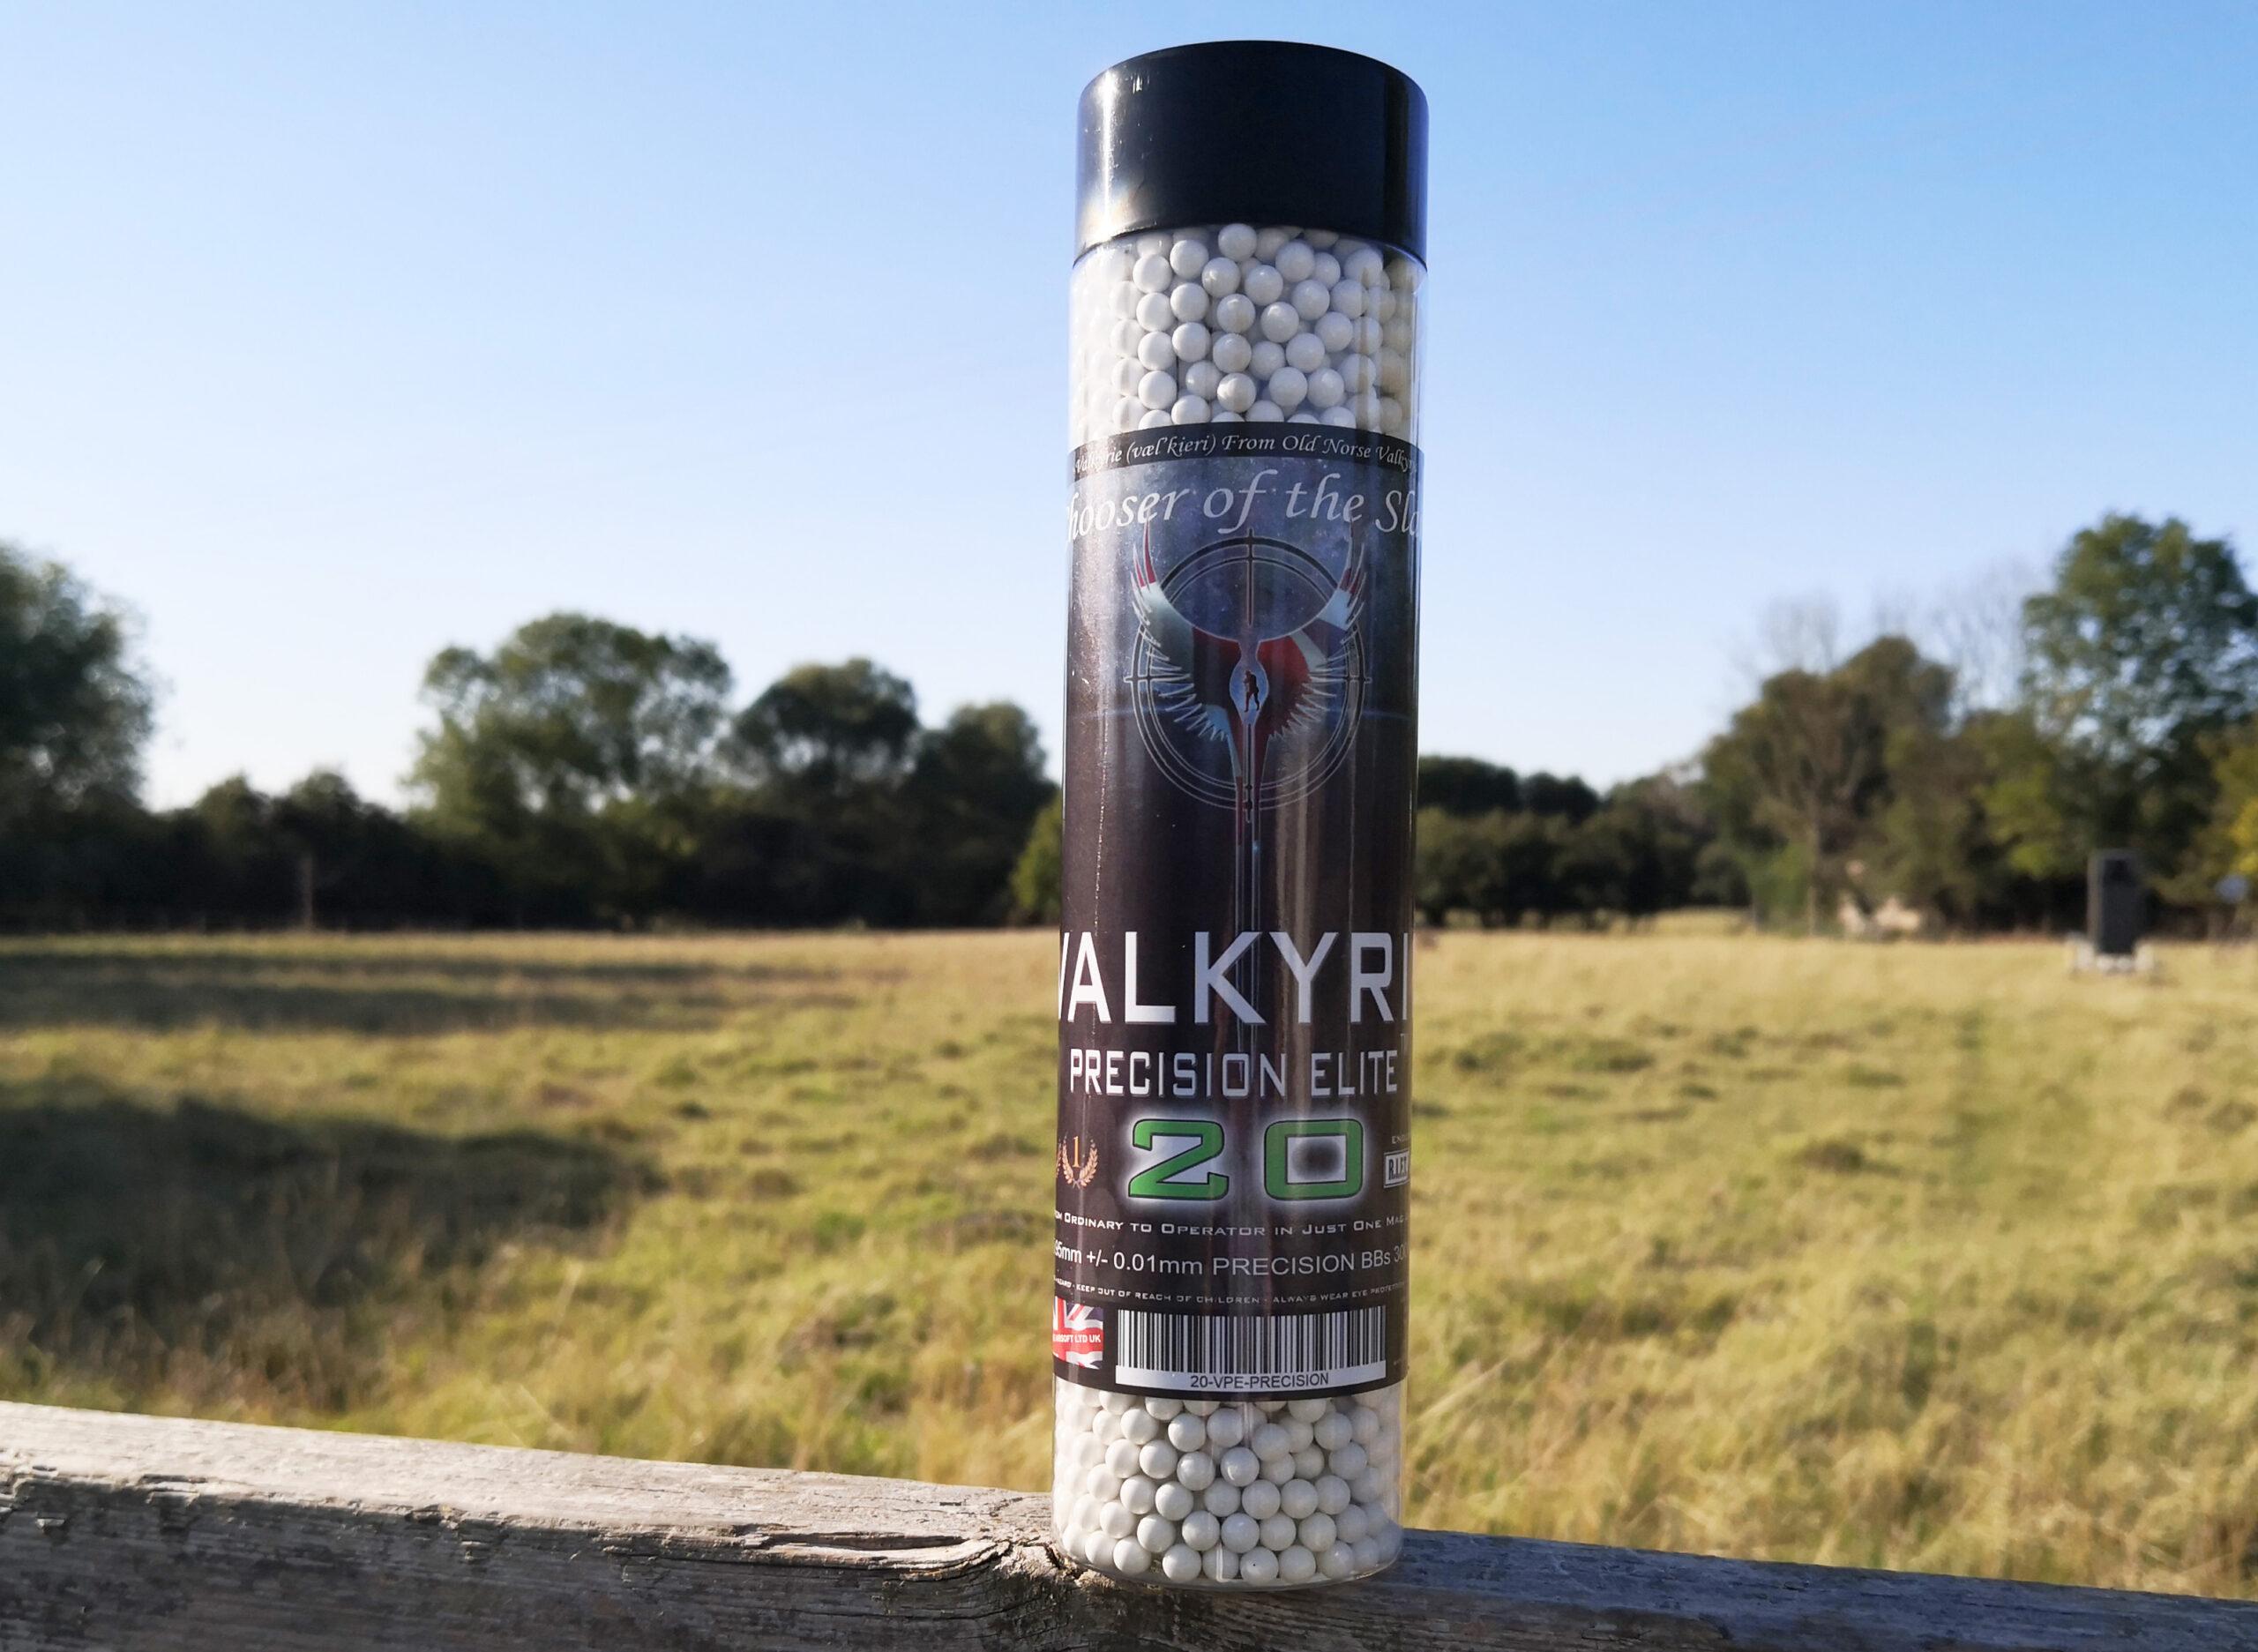 Valkyrie Precision Elite 20 Premium BBs - Consistent - Precise - Accurate